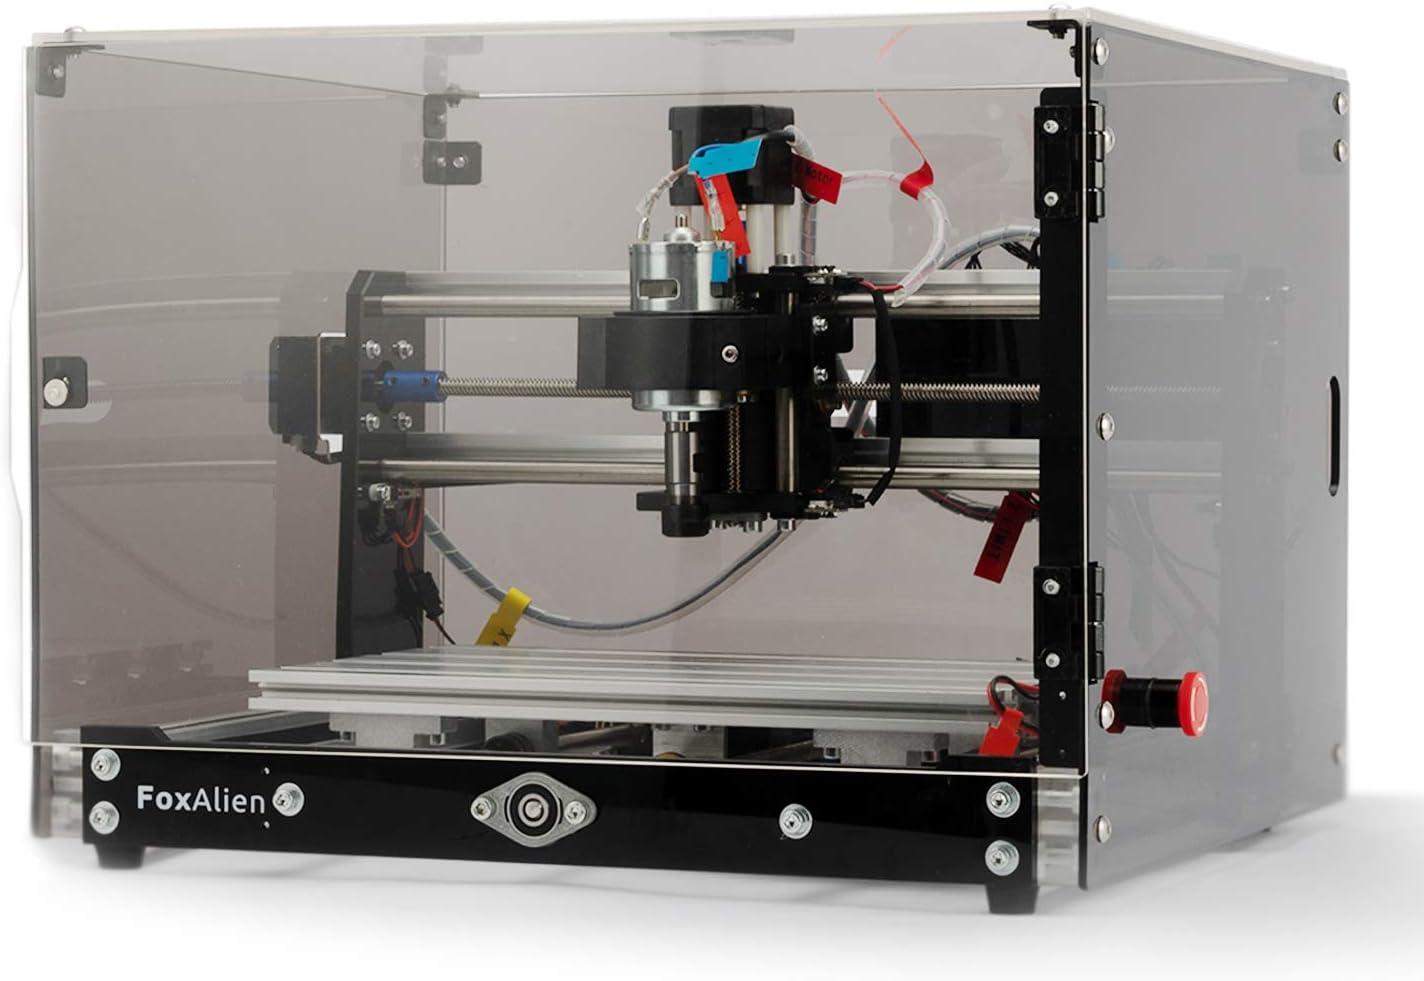 Desktop CNC Router Machine 3018-SE Selling Sales results No. 1 Enclosure with Transparent V2